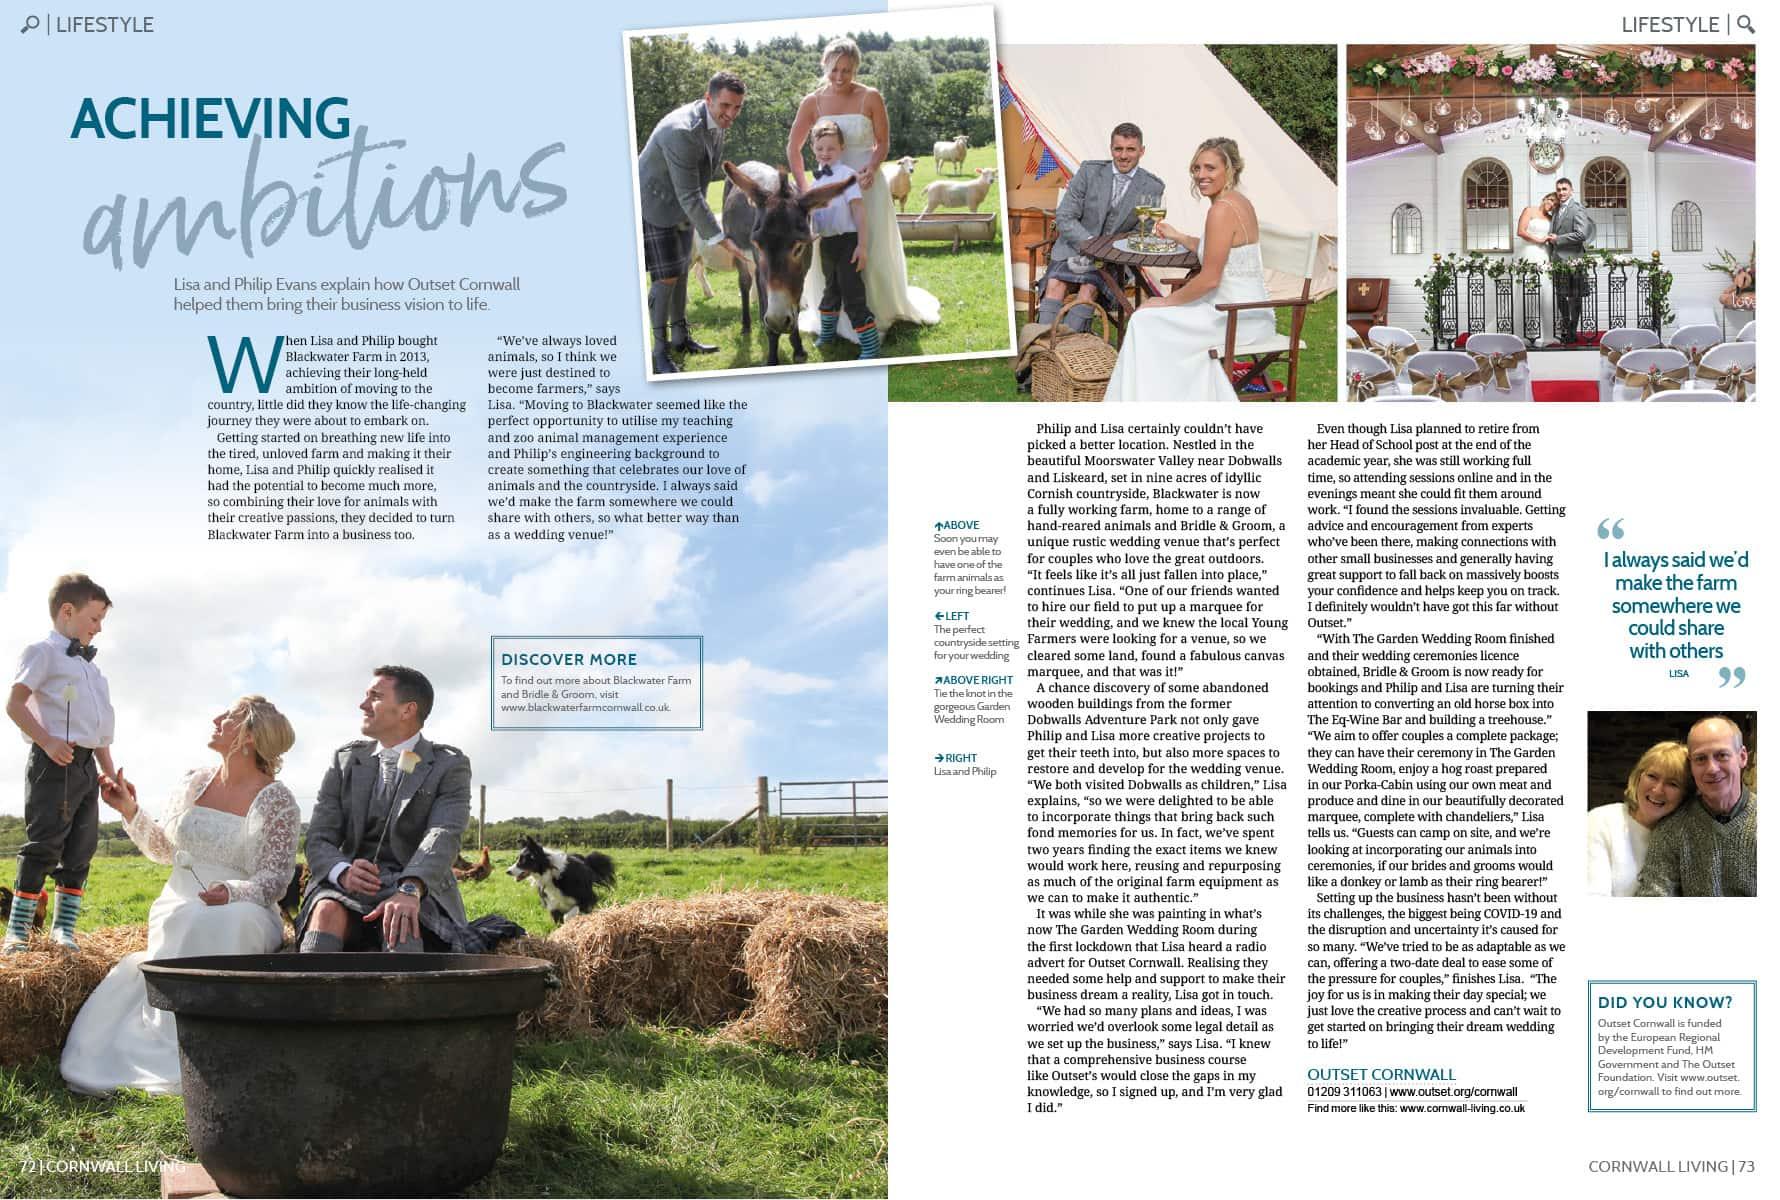 cornwall living article about blackwater farmin cornwall as a wedding venue